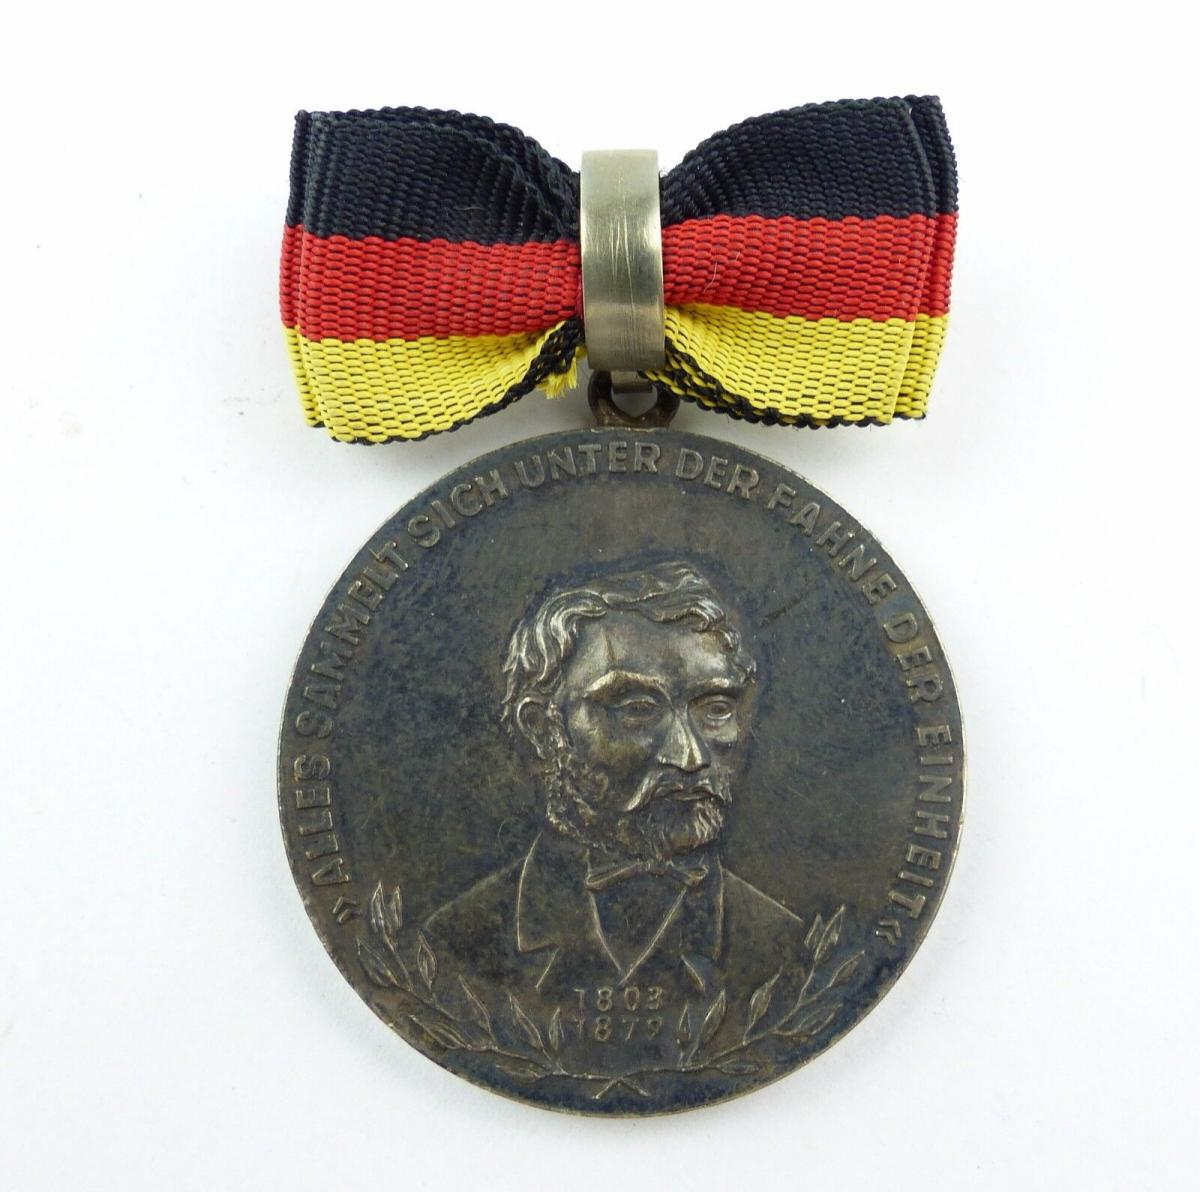 #e7761 Carl-Friedrich-Wilhelm-Wander-Medaille Silber 900 vgl. Nr. 130 (1954-55) 8